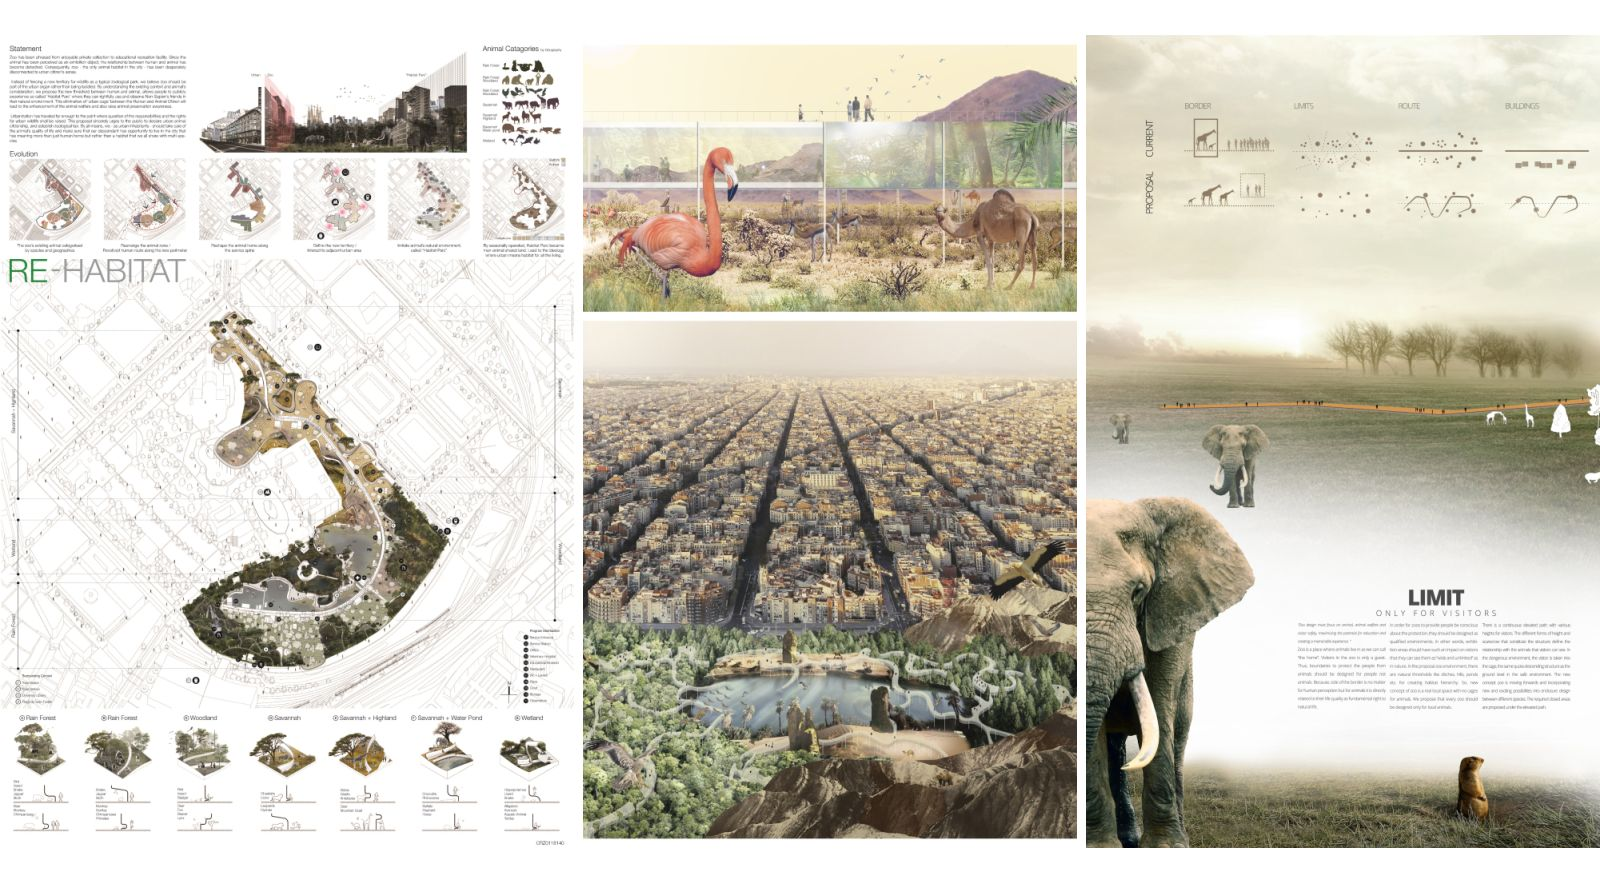 Rethinking Zoos